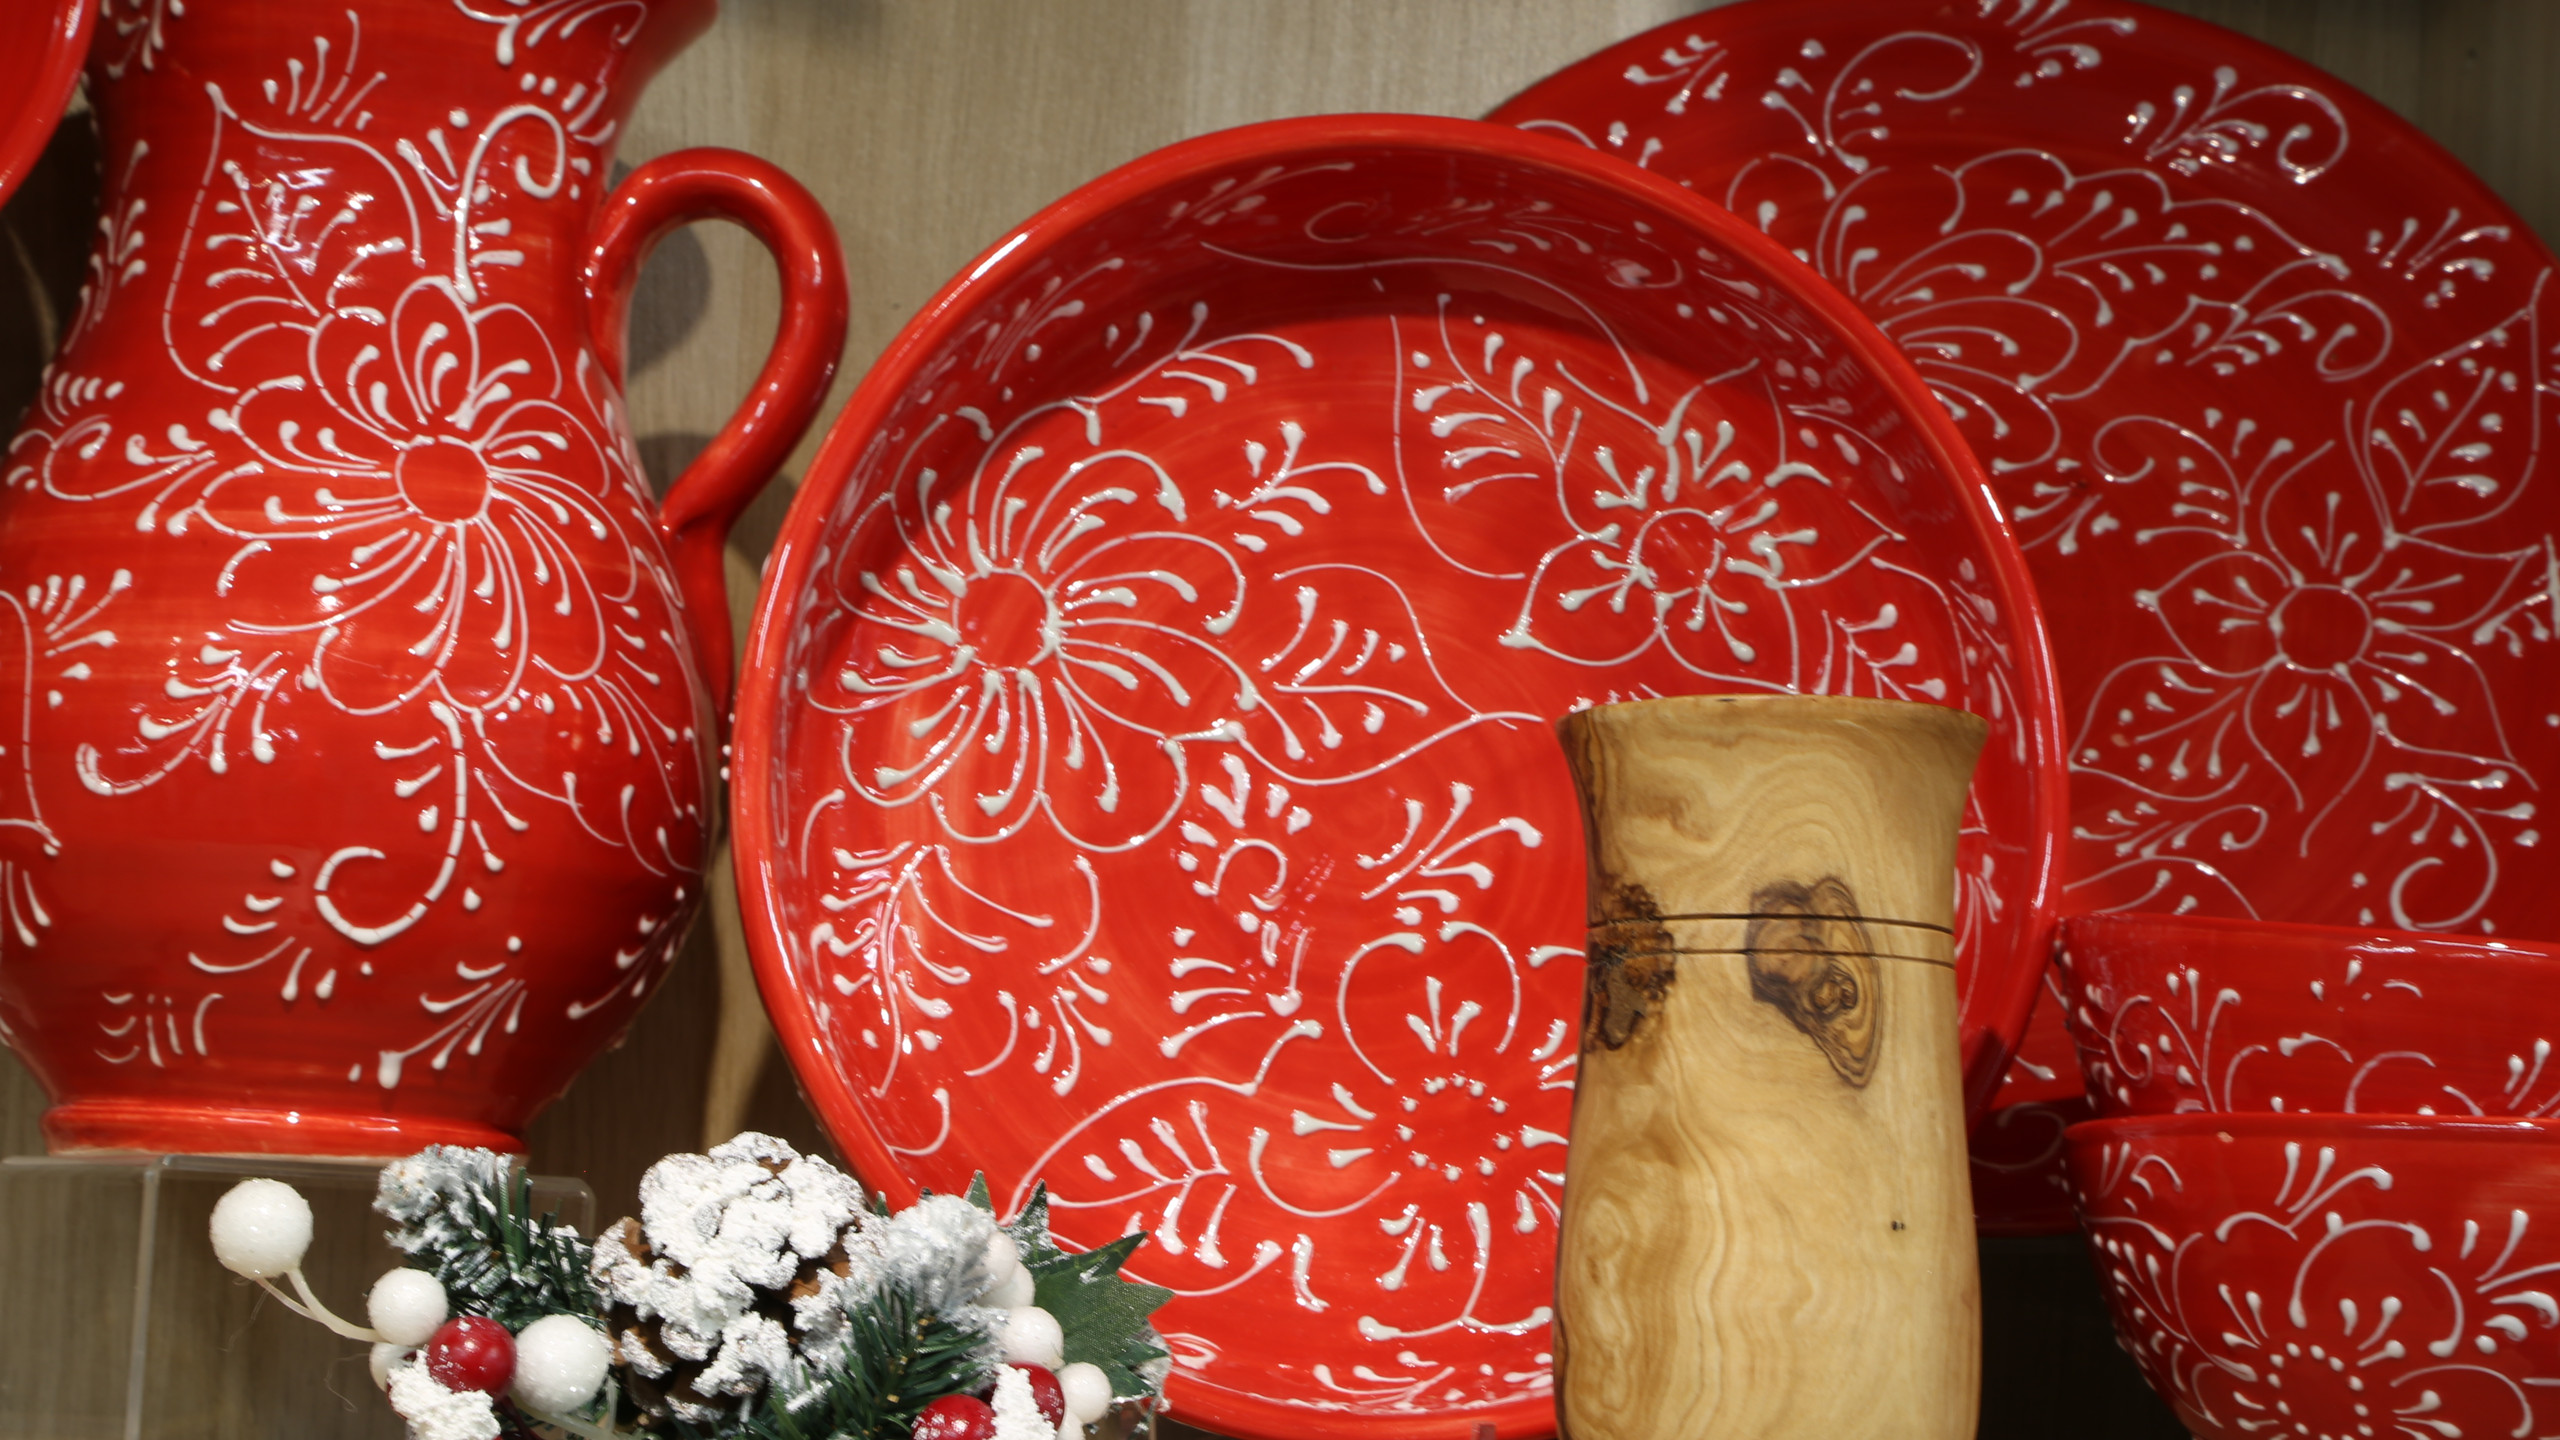 Red flower patterned tableware